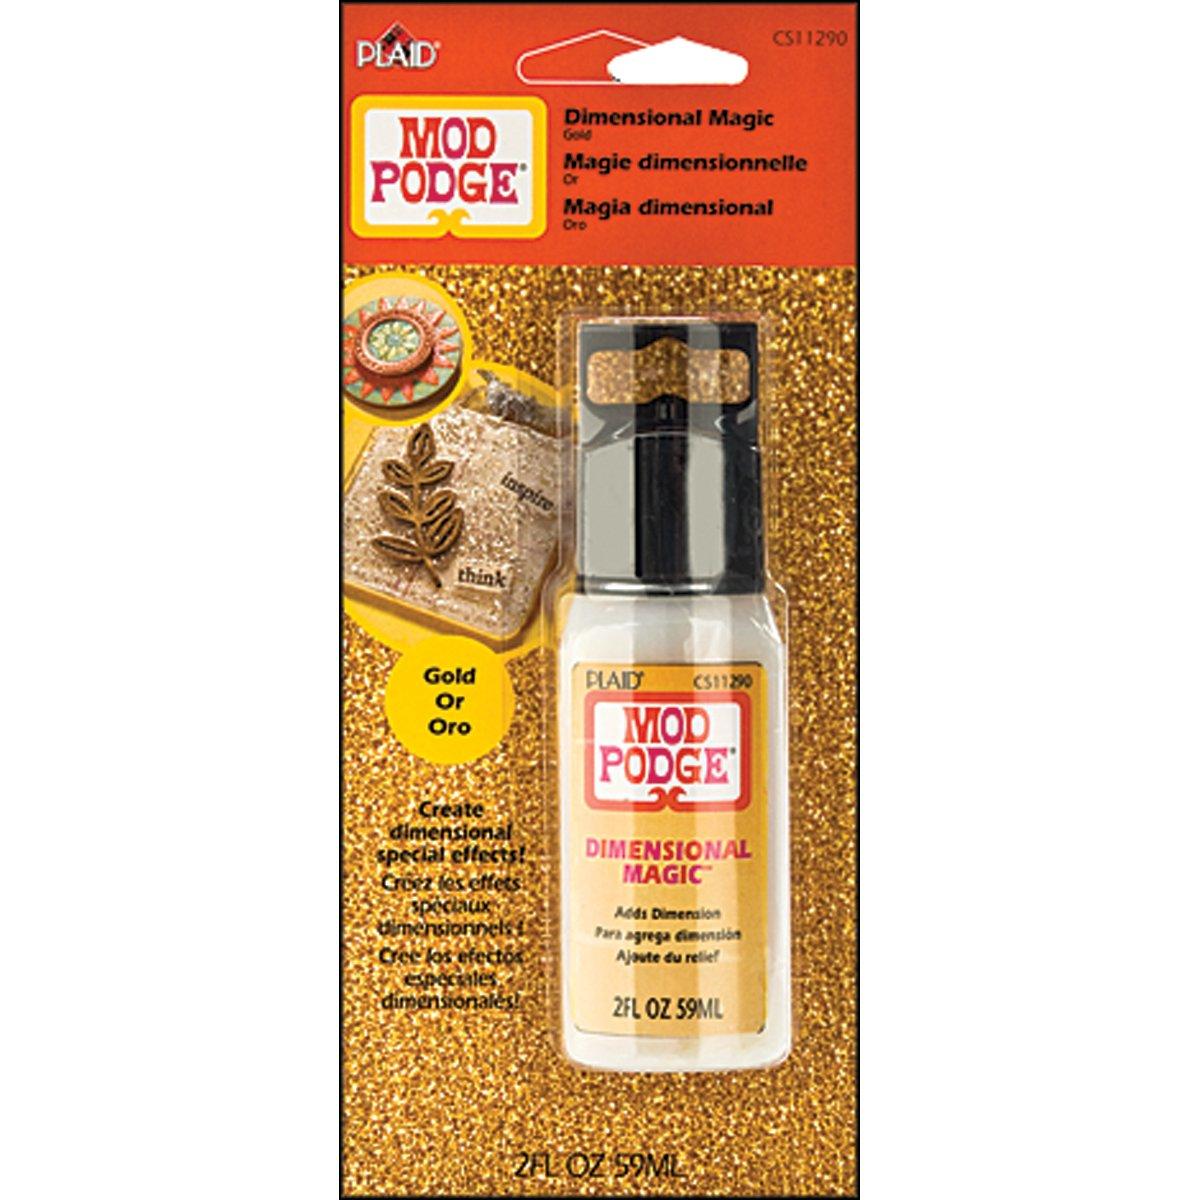 Mod Podge Dimensional Magic (2-Ounce), CS11290 Glitter Gold Plaid Inc.